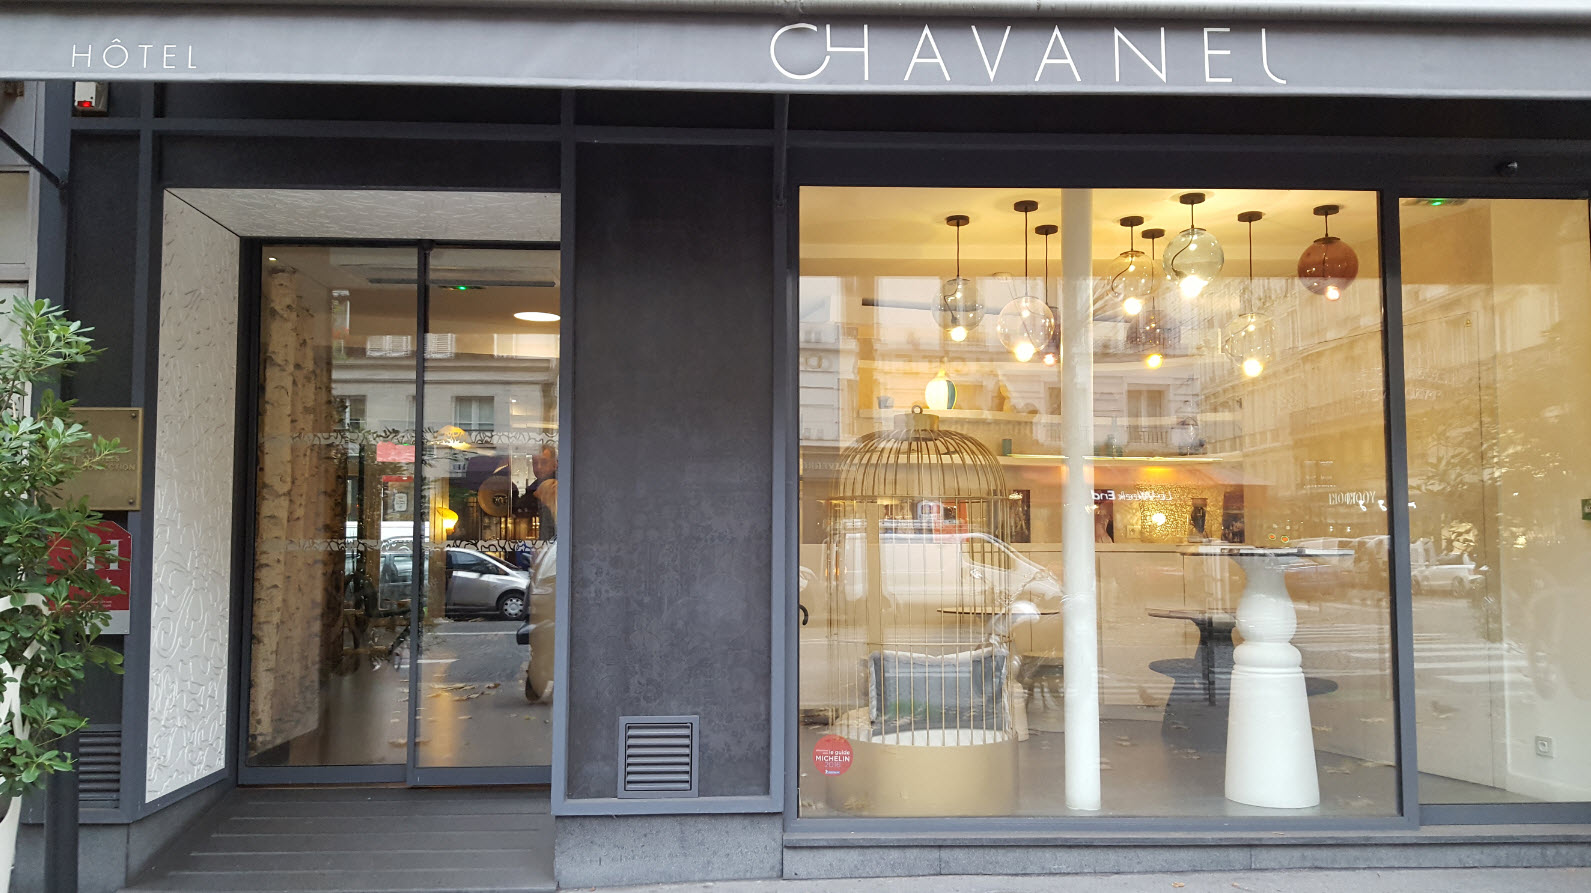 Entree hotel Chavanel